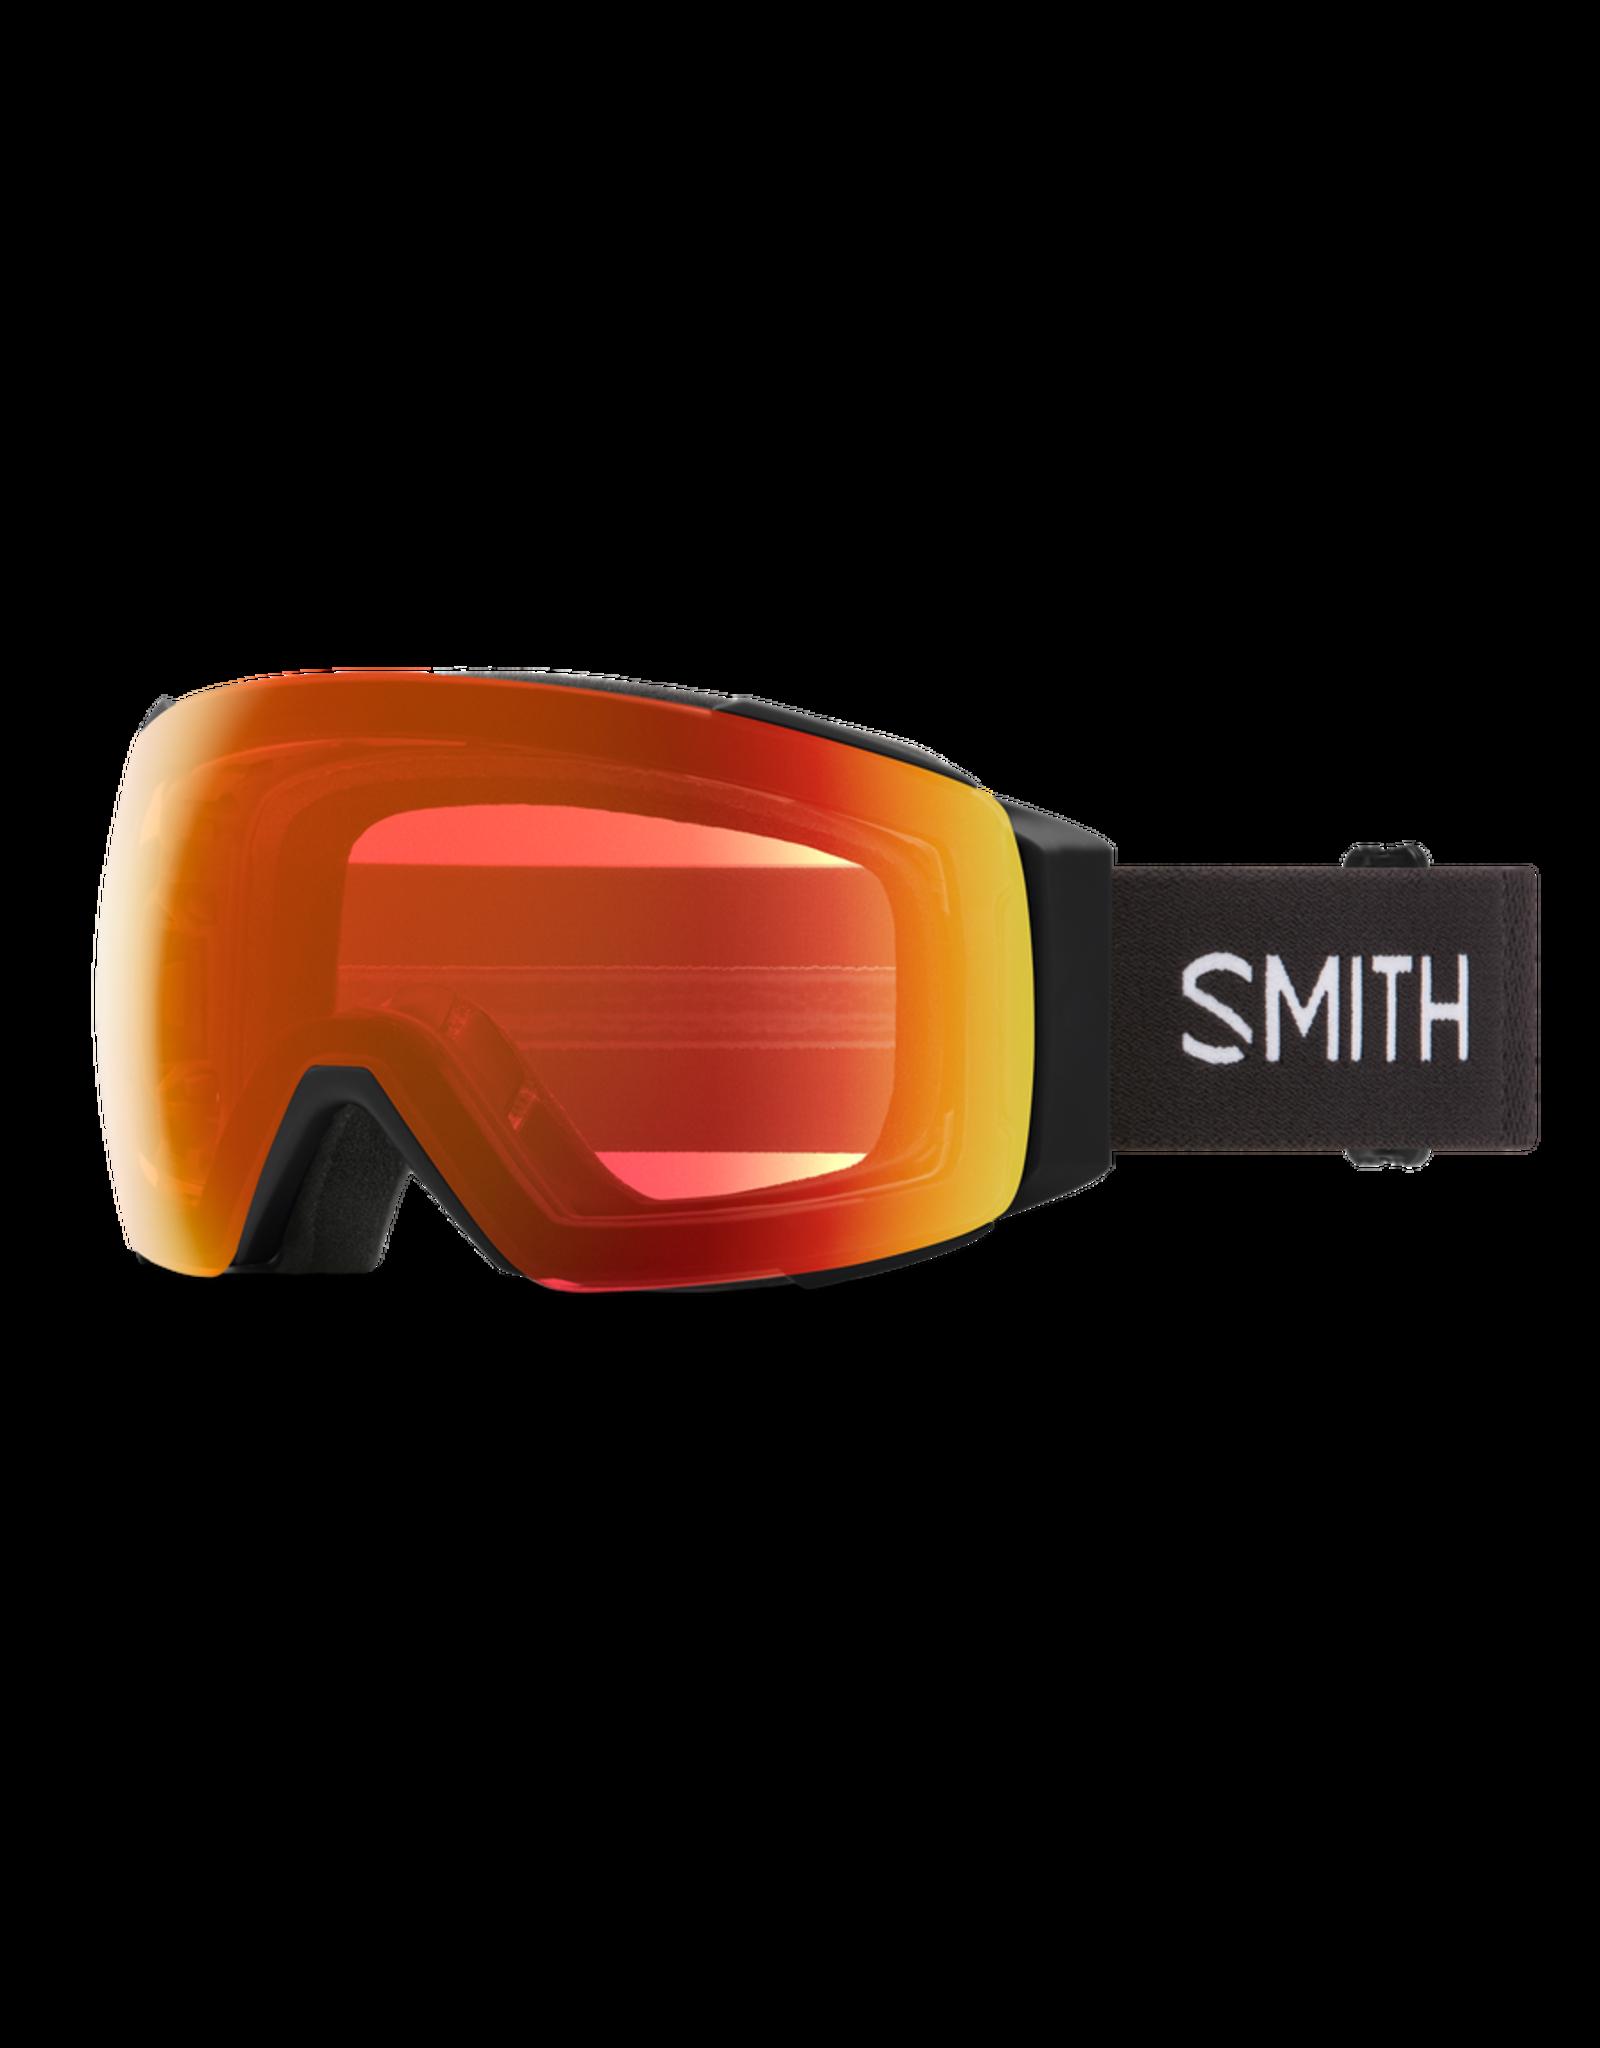 SMITH I/O MAG Black w/Chromapop Everyday Red Mirror and Chromapop Storm Yellow Flash